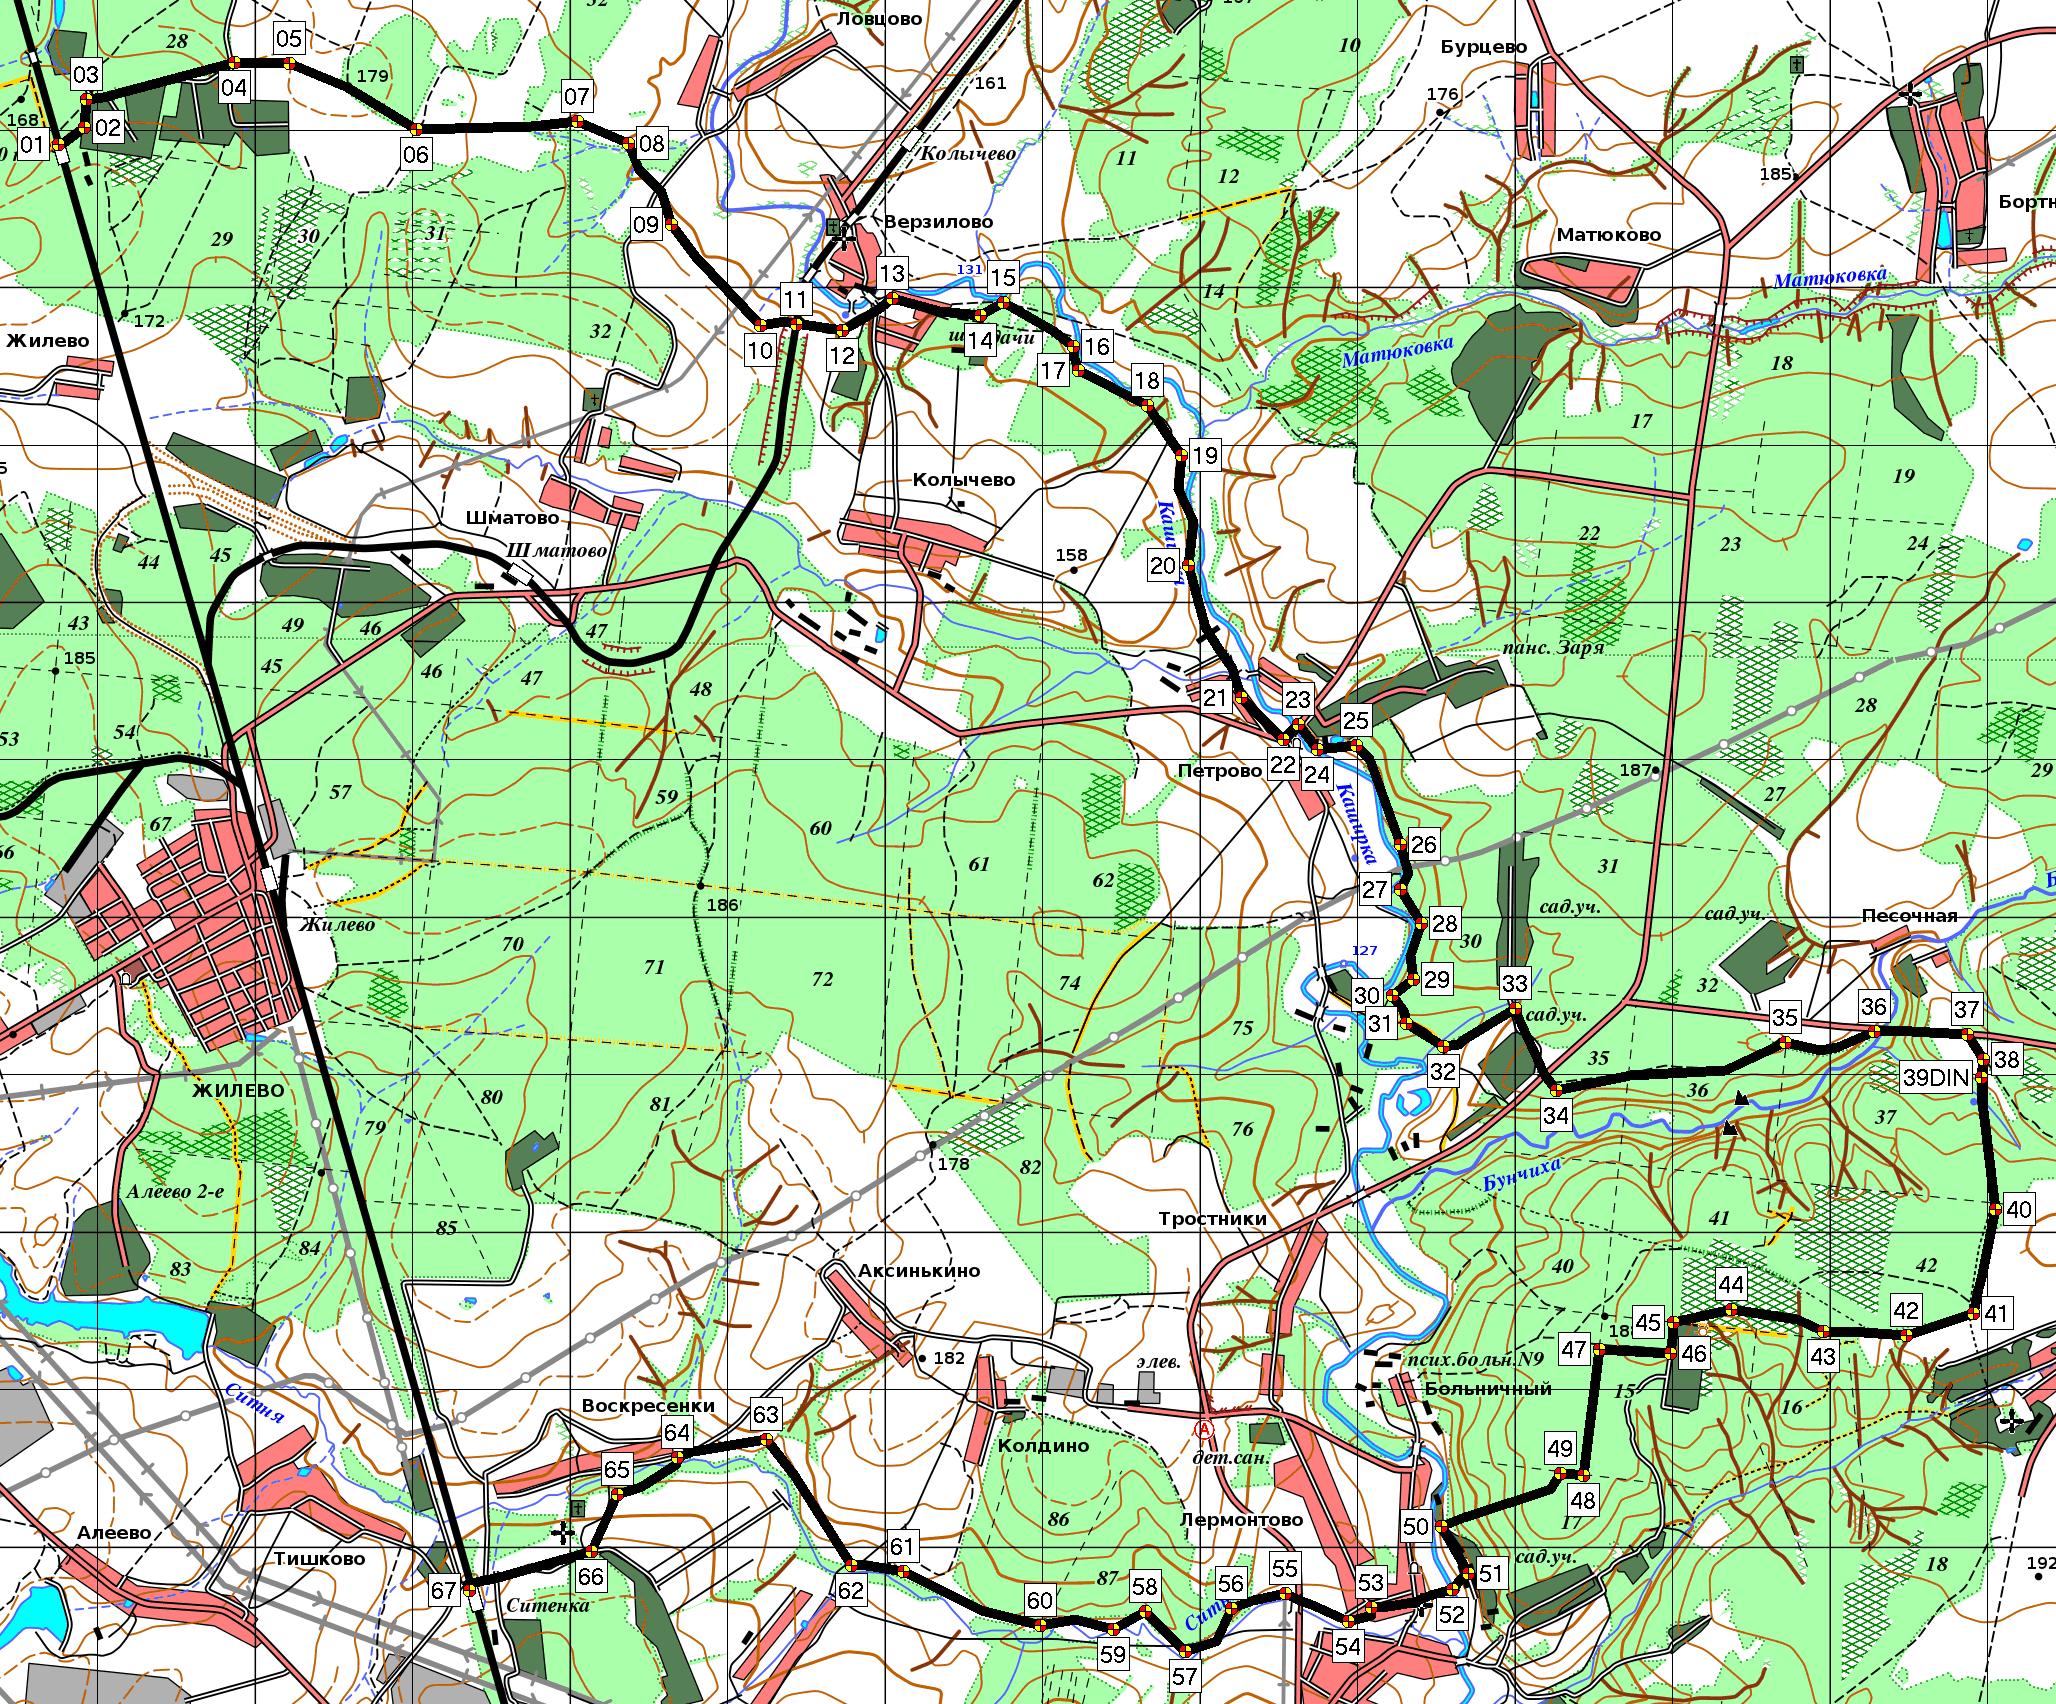 85-sitenka_map500_1